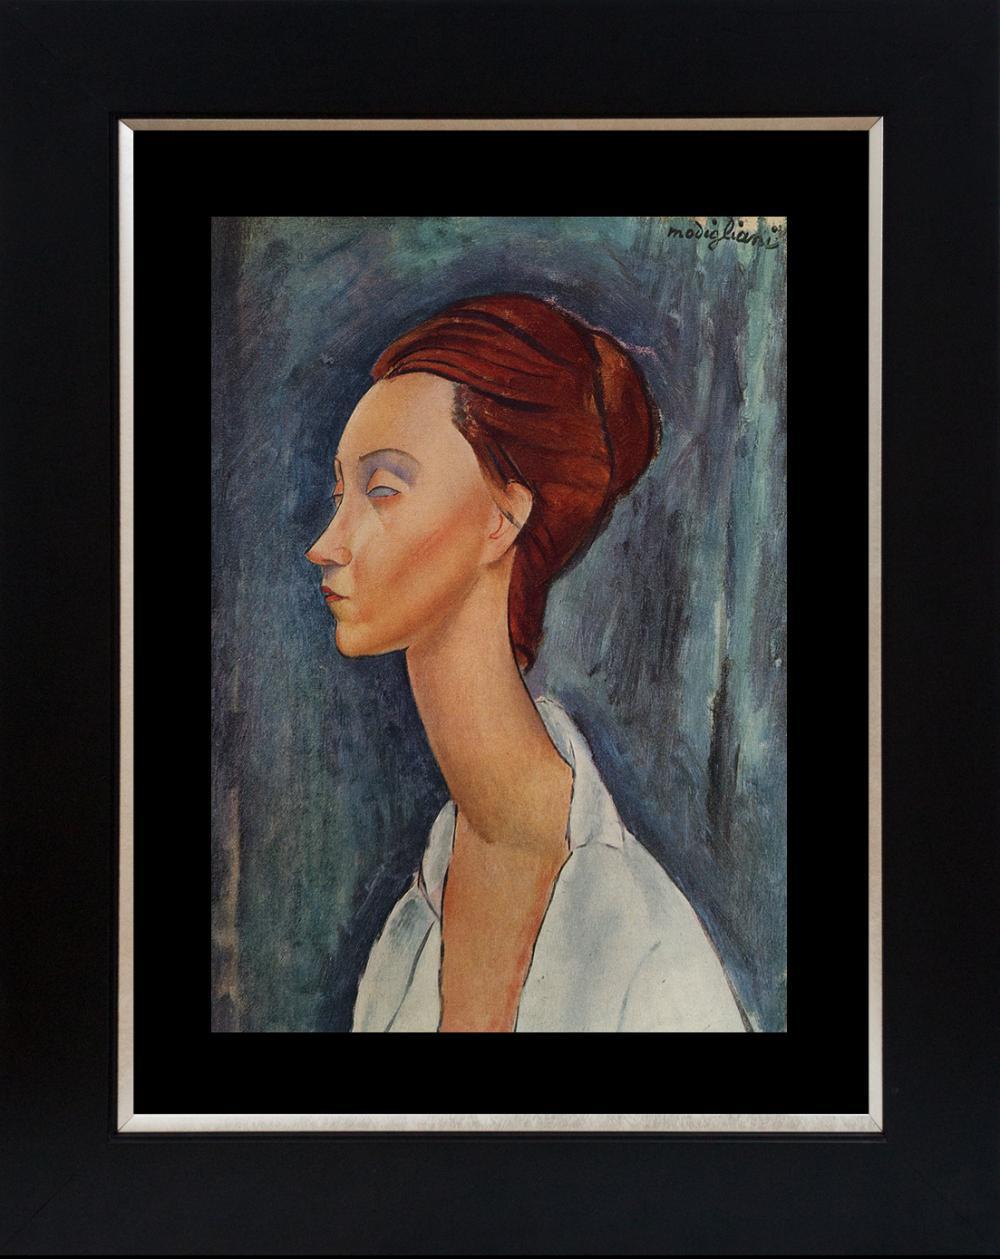 Modigliani Lithograph from 1967